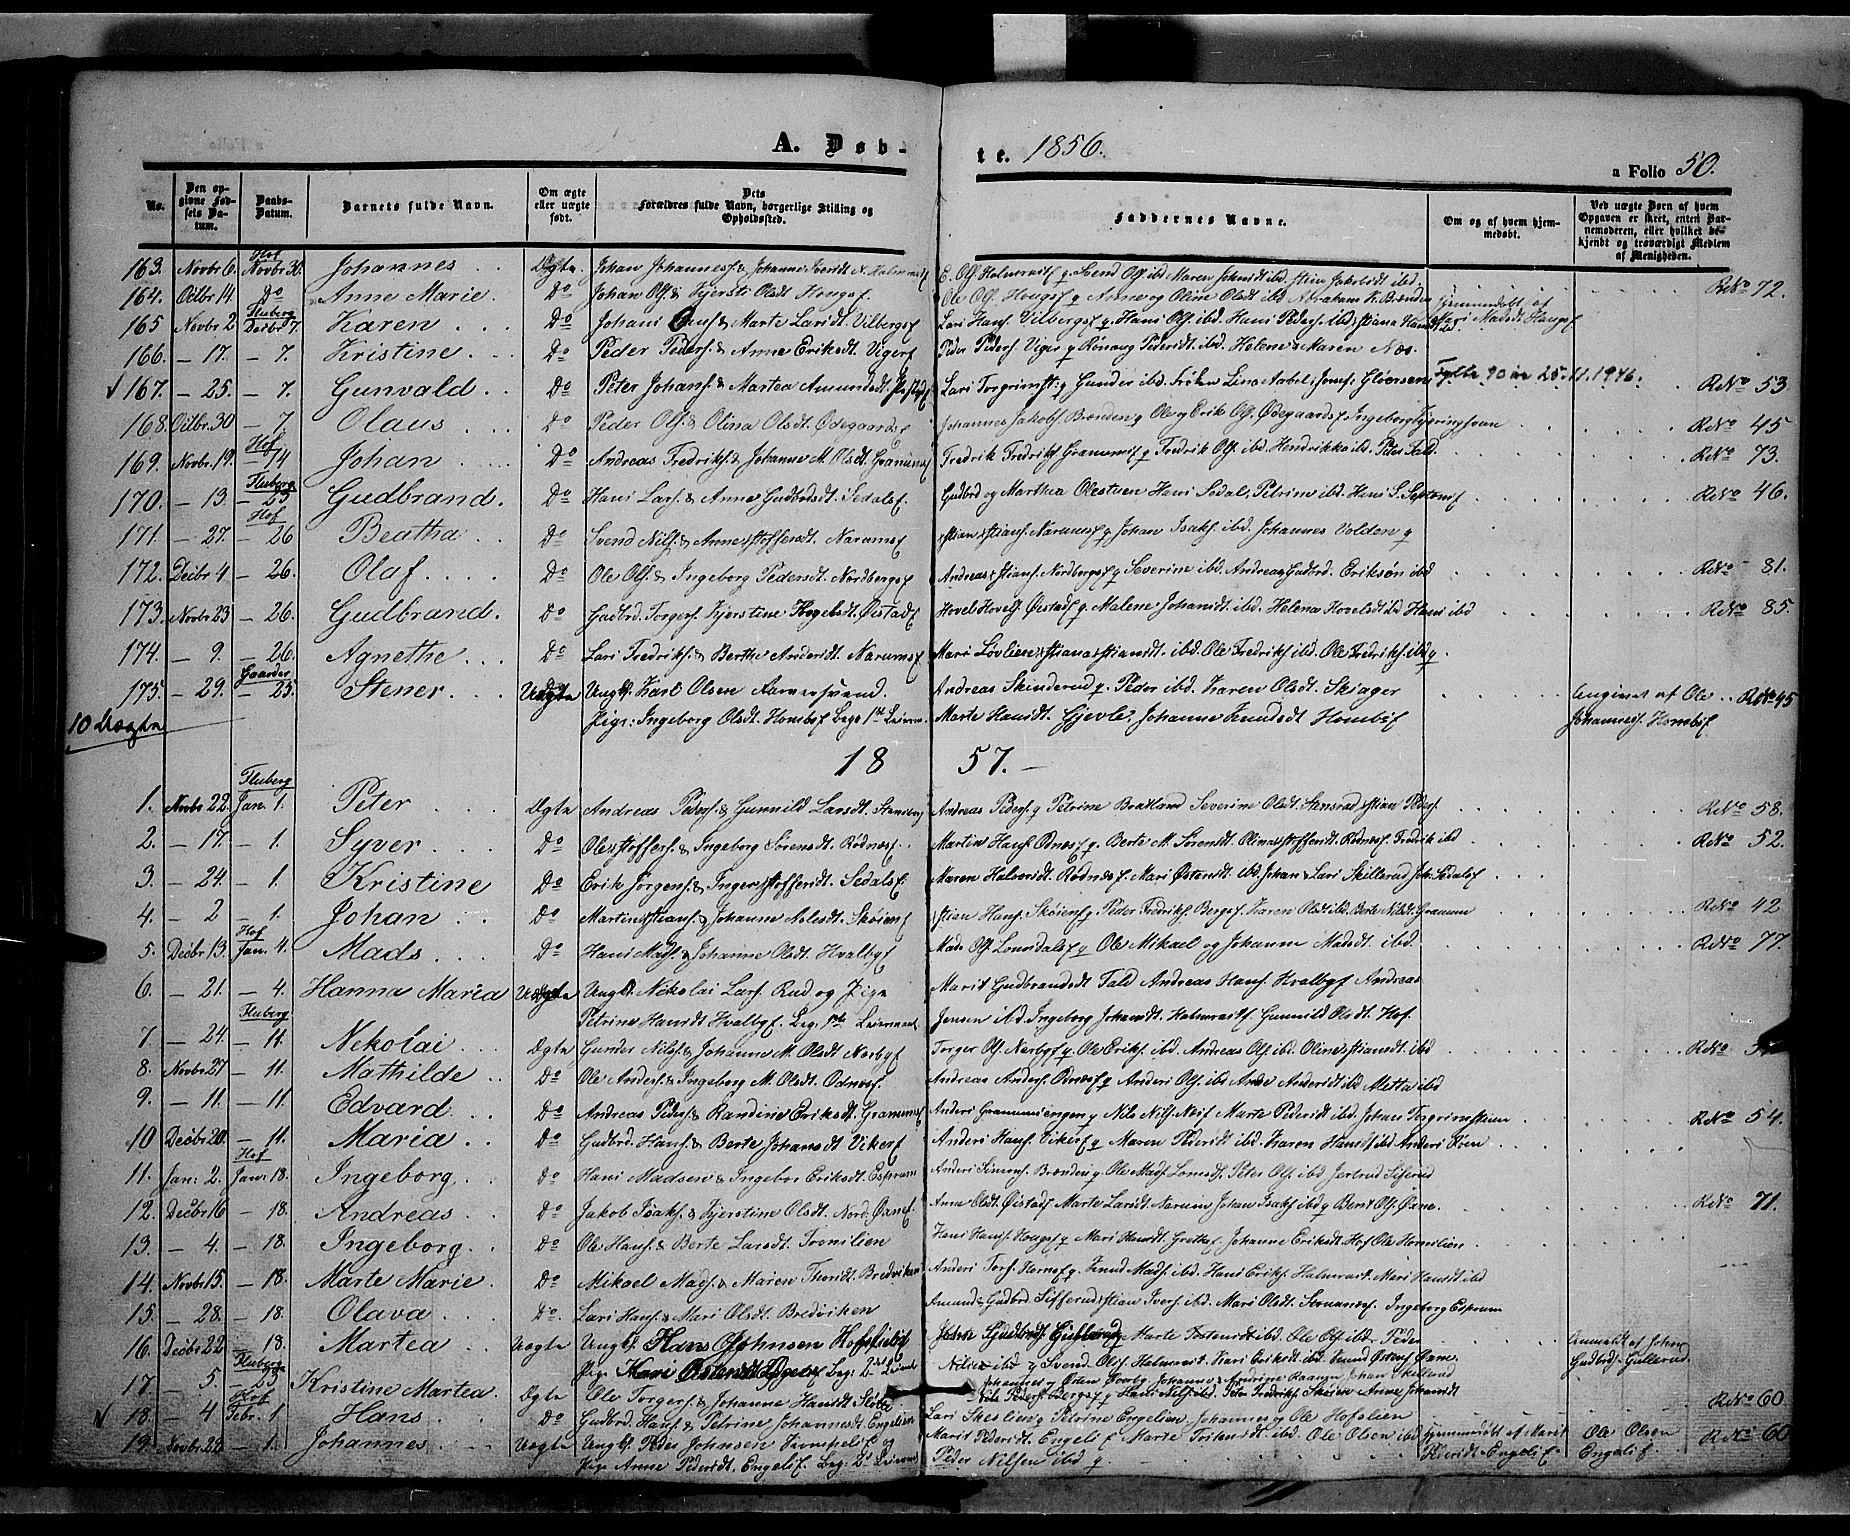 SAH, Land prestekontor, Ministerialbok nr. 9, 1847-1859, s. 50